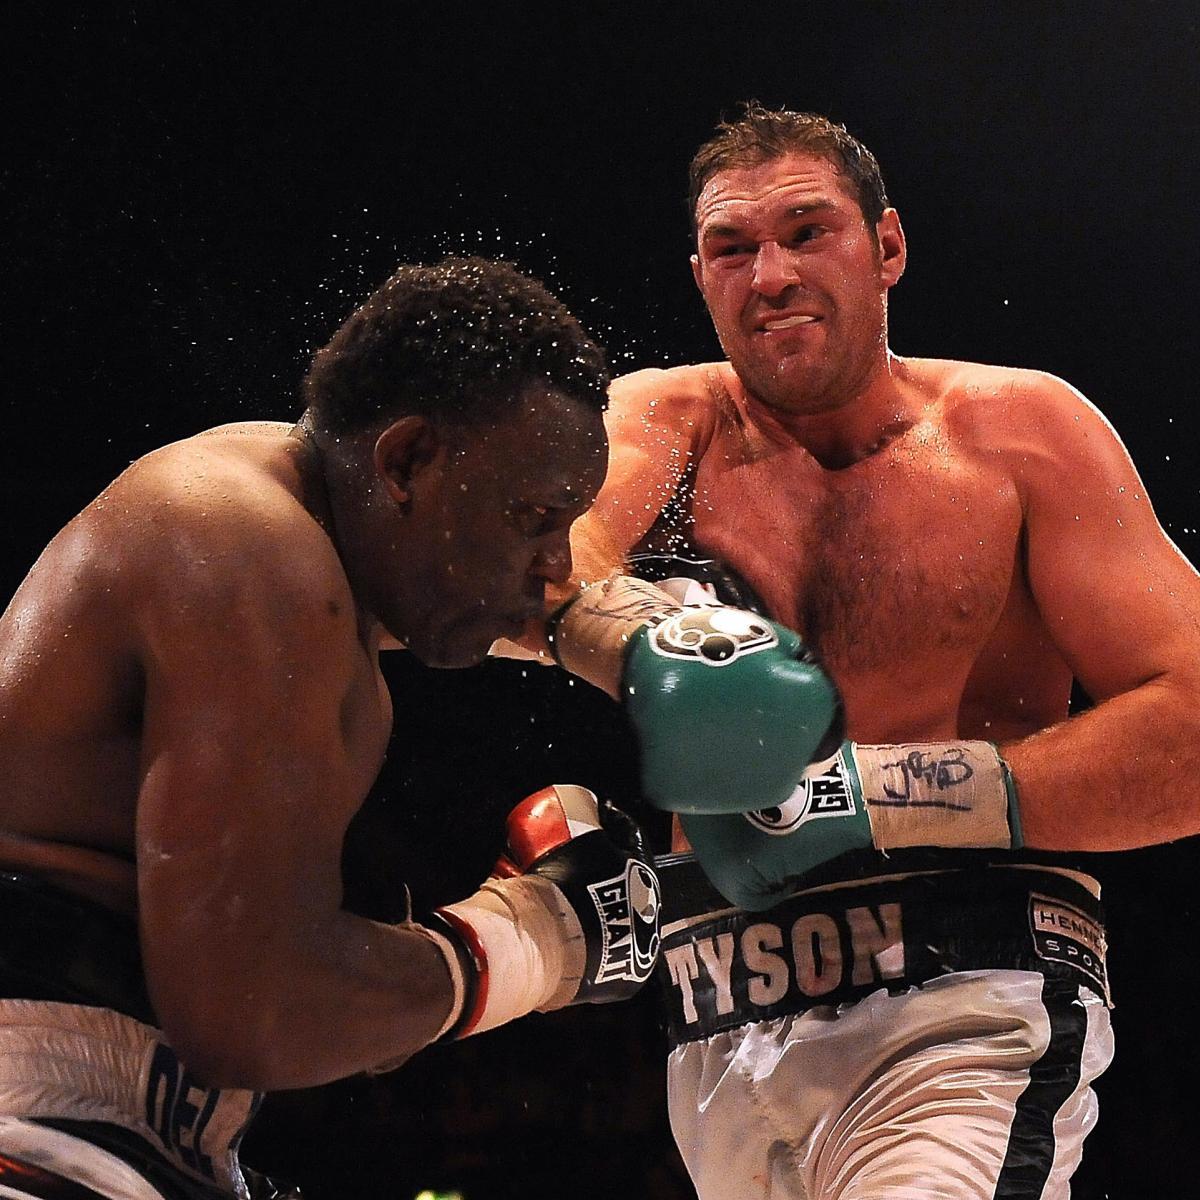 Is Tyson Fury The Next Great Heavyweight?